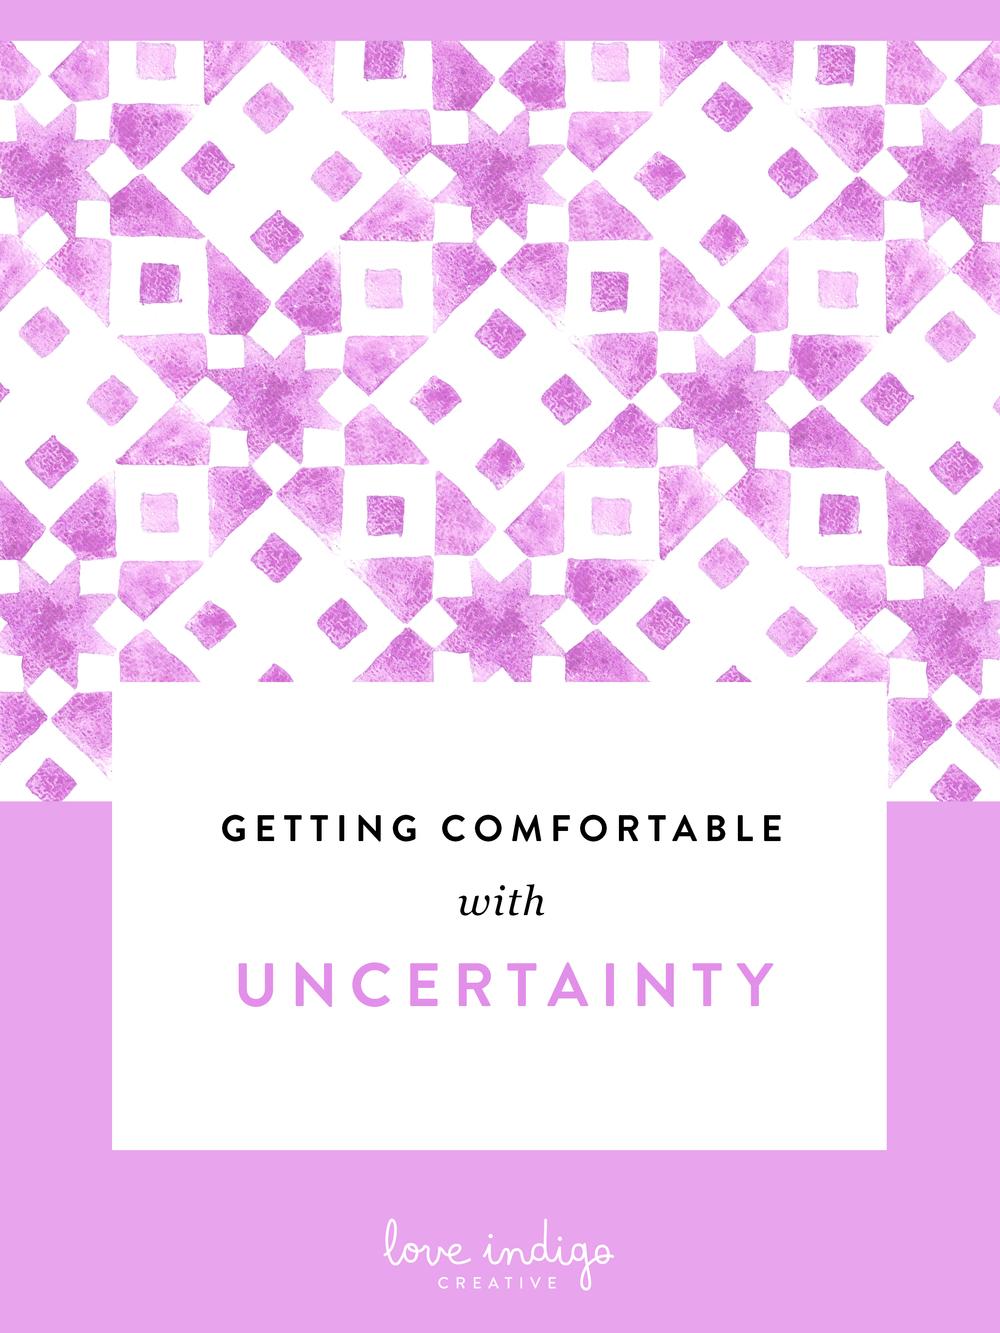 Getting Comfortable with Uncertainty | Love Indigo Creative